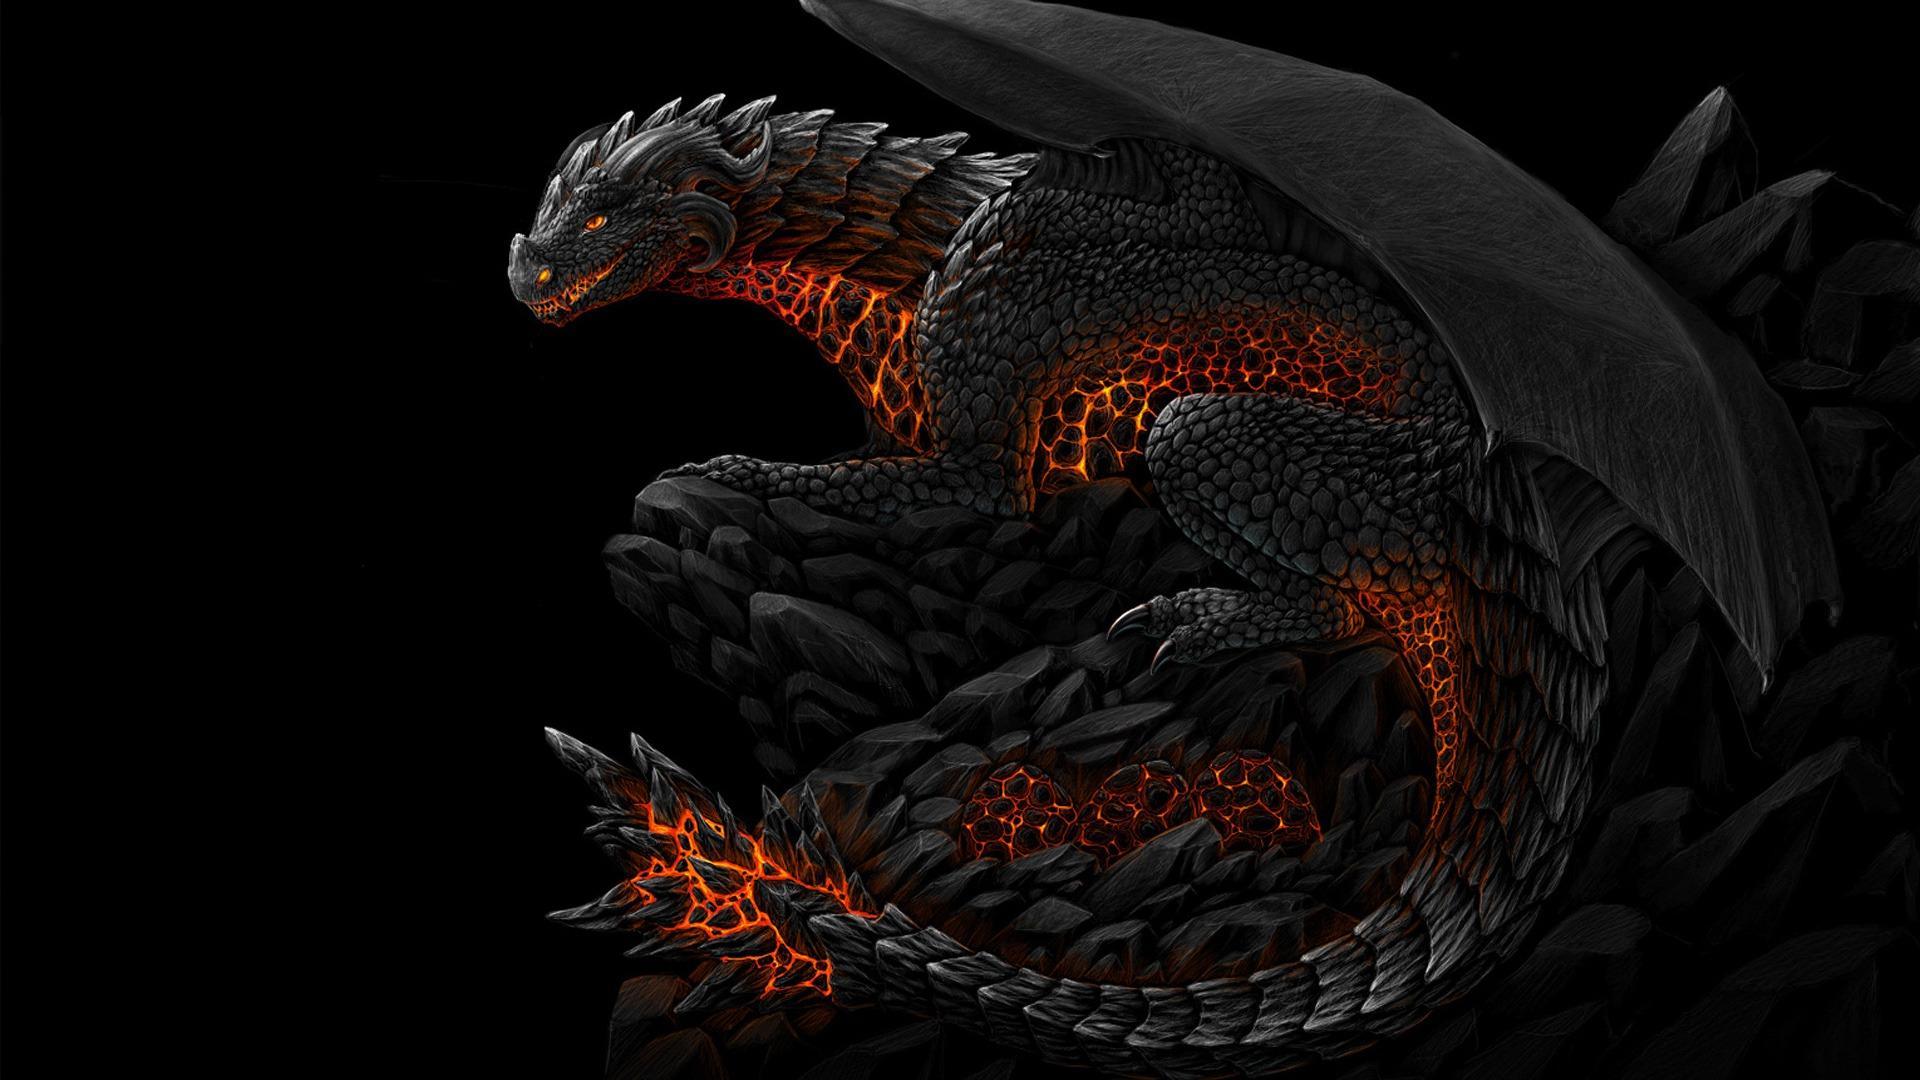 Black Dragon Wallpapers